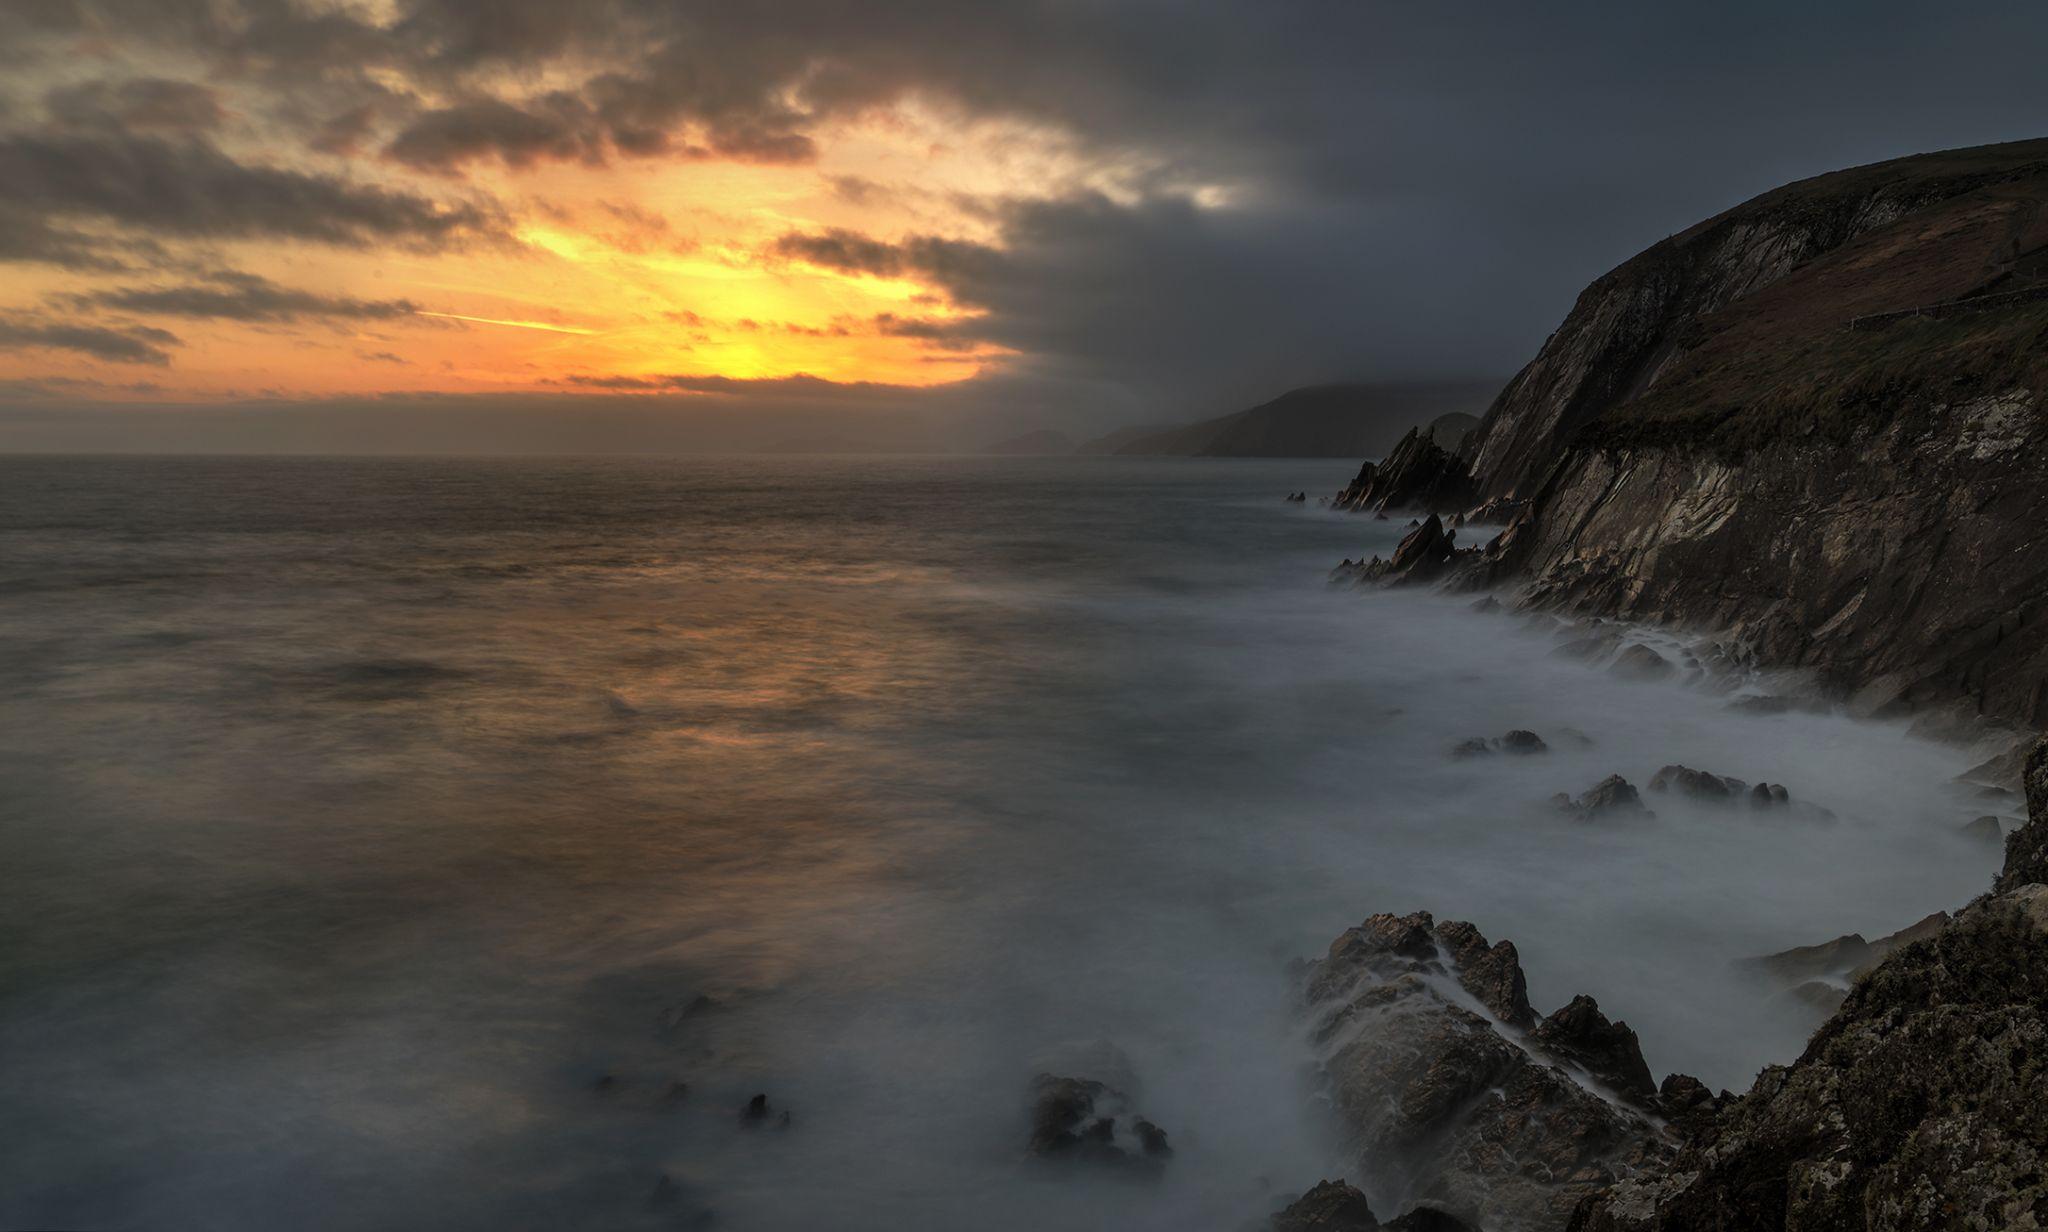 Coomeenoule Sunset, Ireland